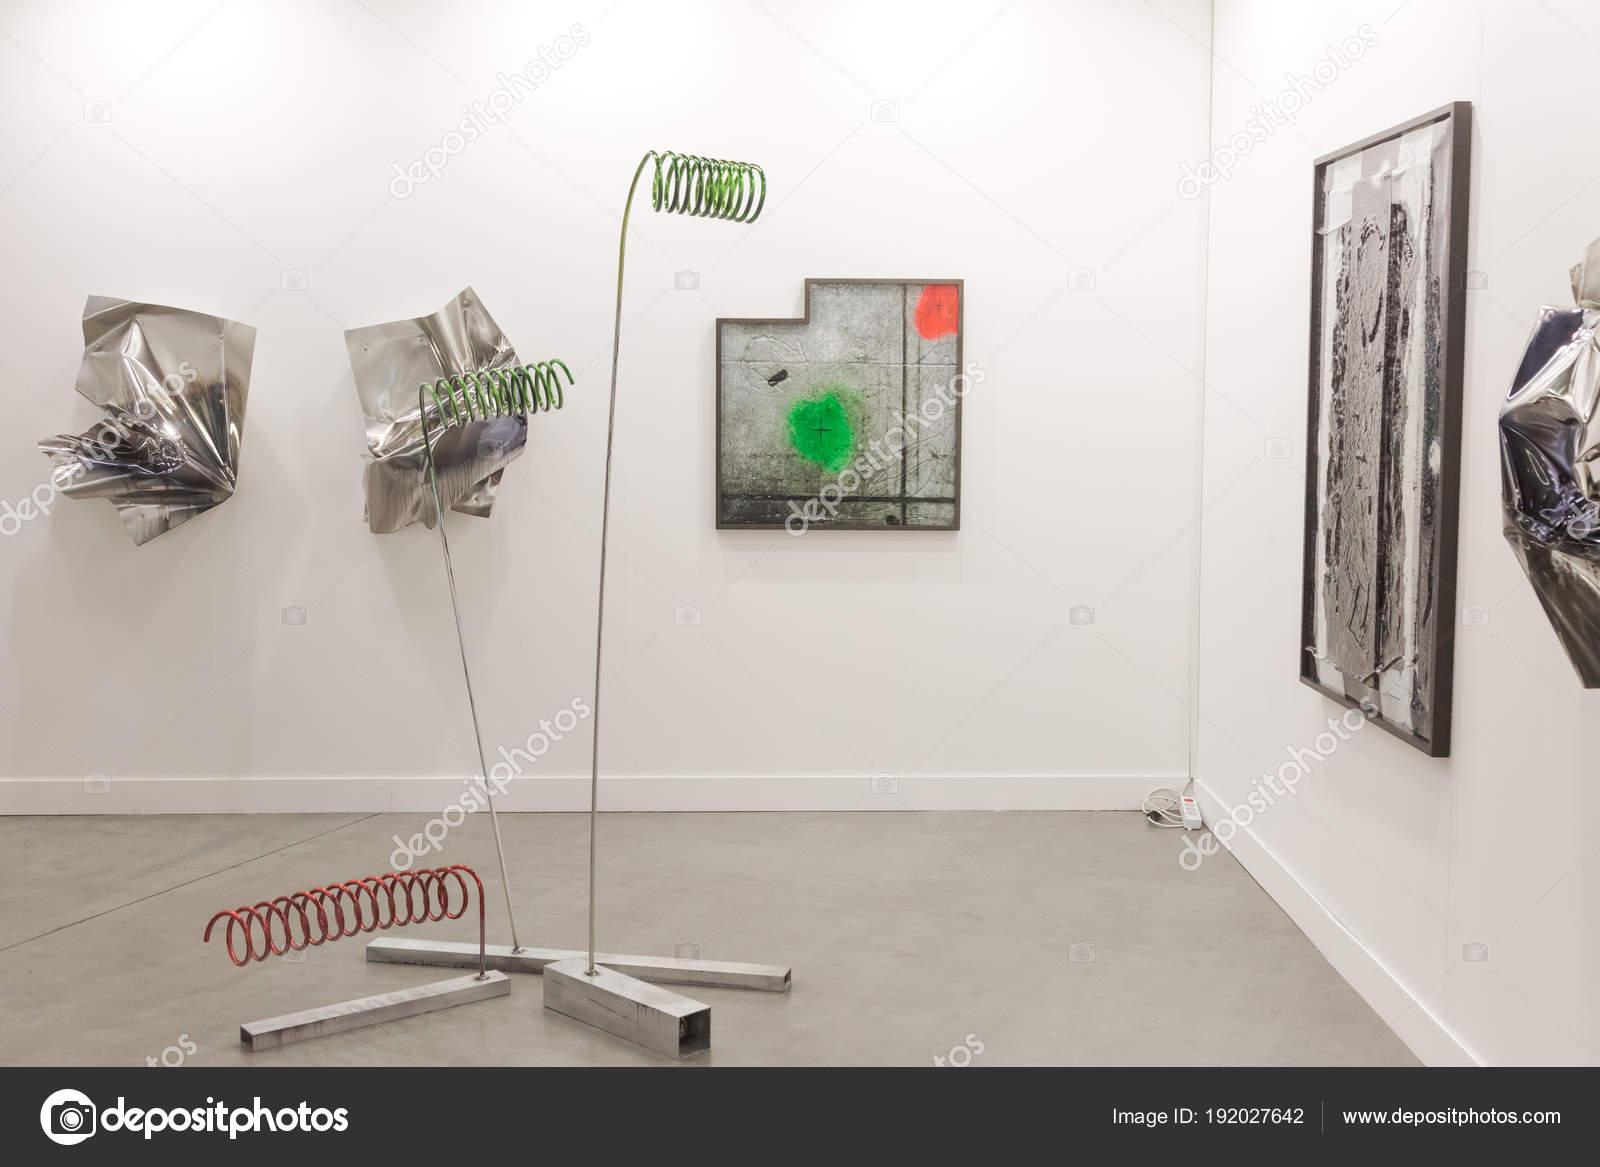 Artworks At Miart 2018 In Milan Italy Stock Editorial